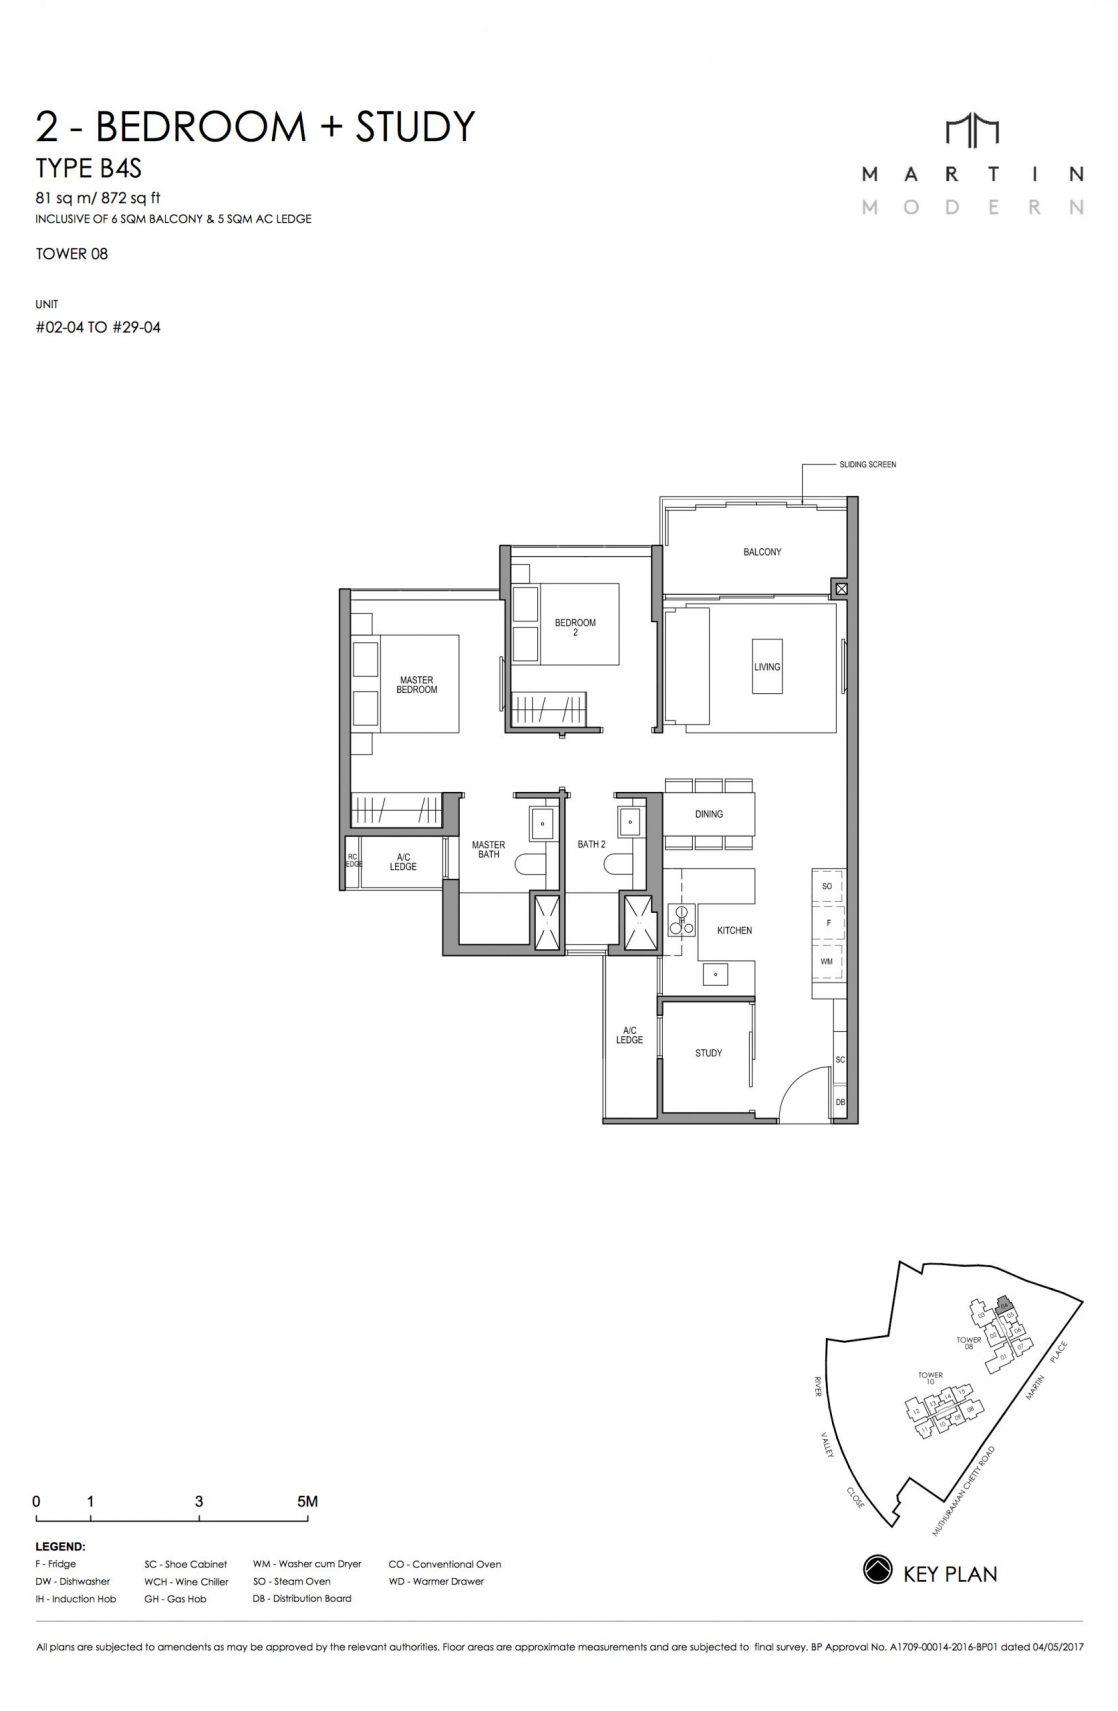 MARTIN MODERN 2-Bedroom TYPE B4S